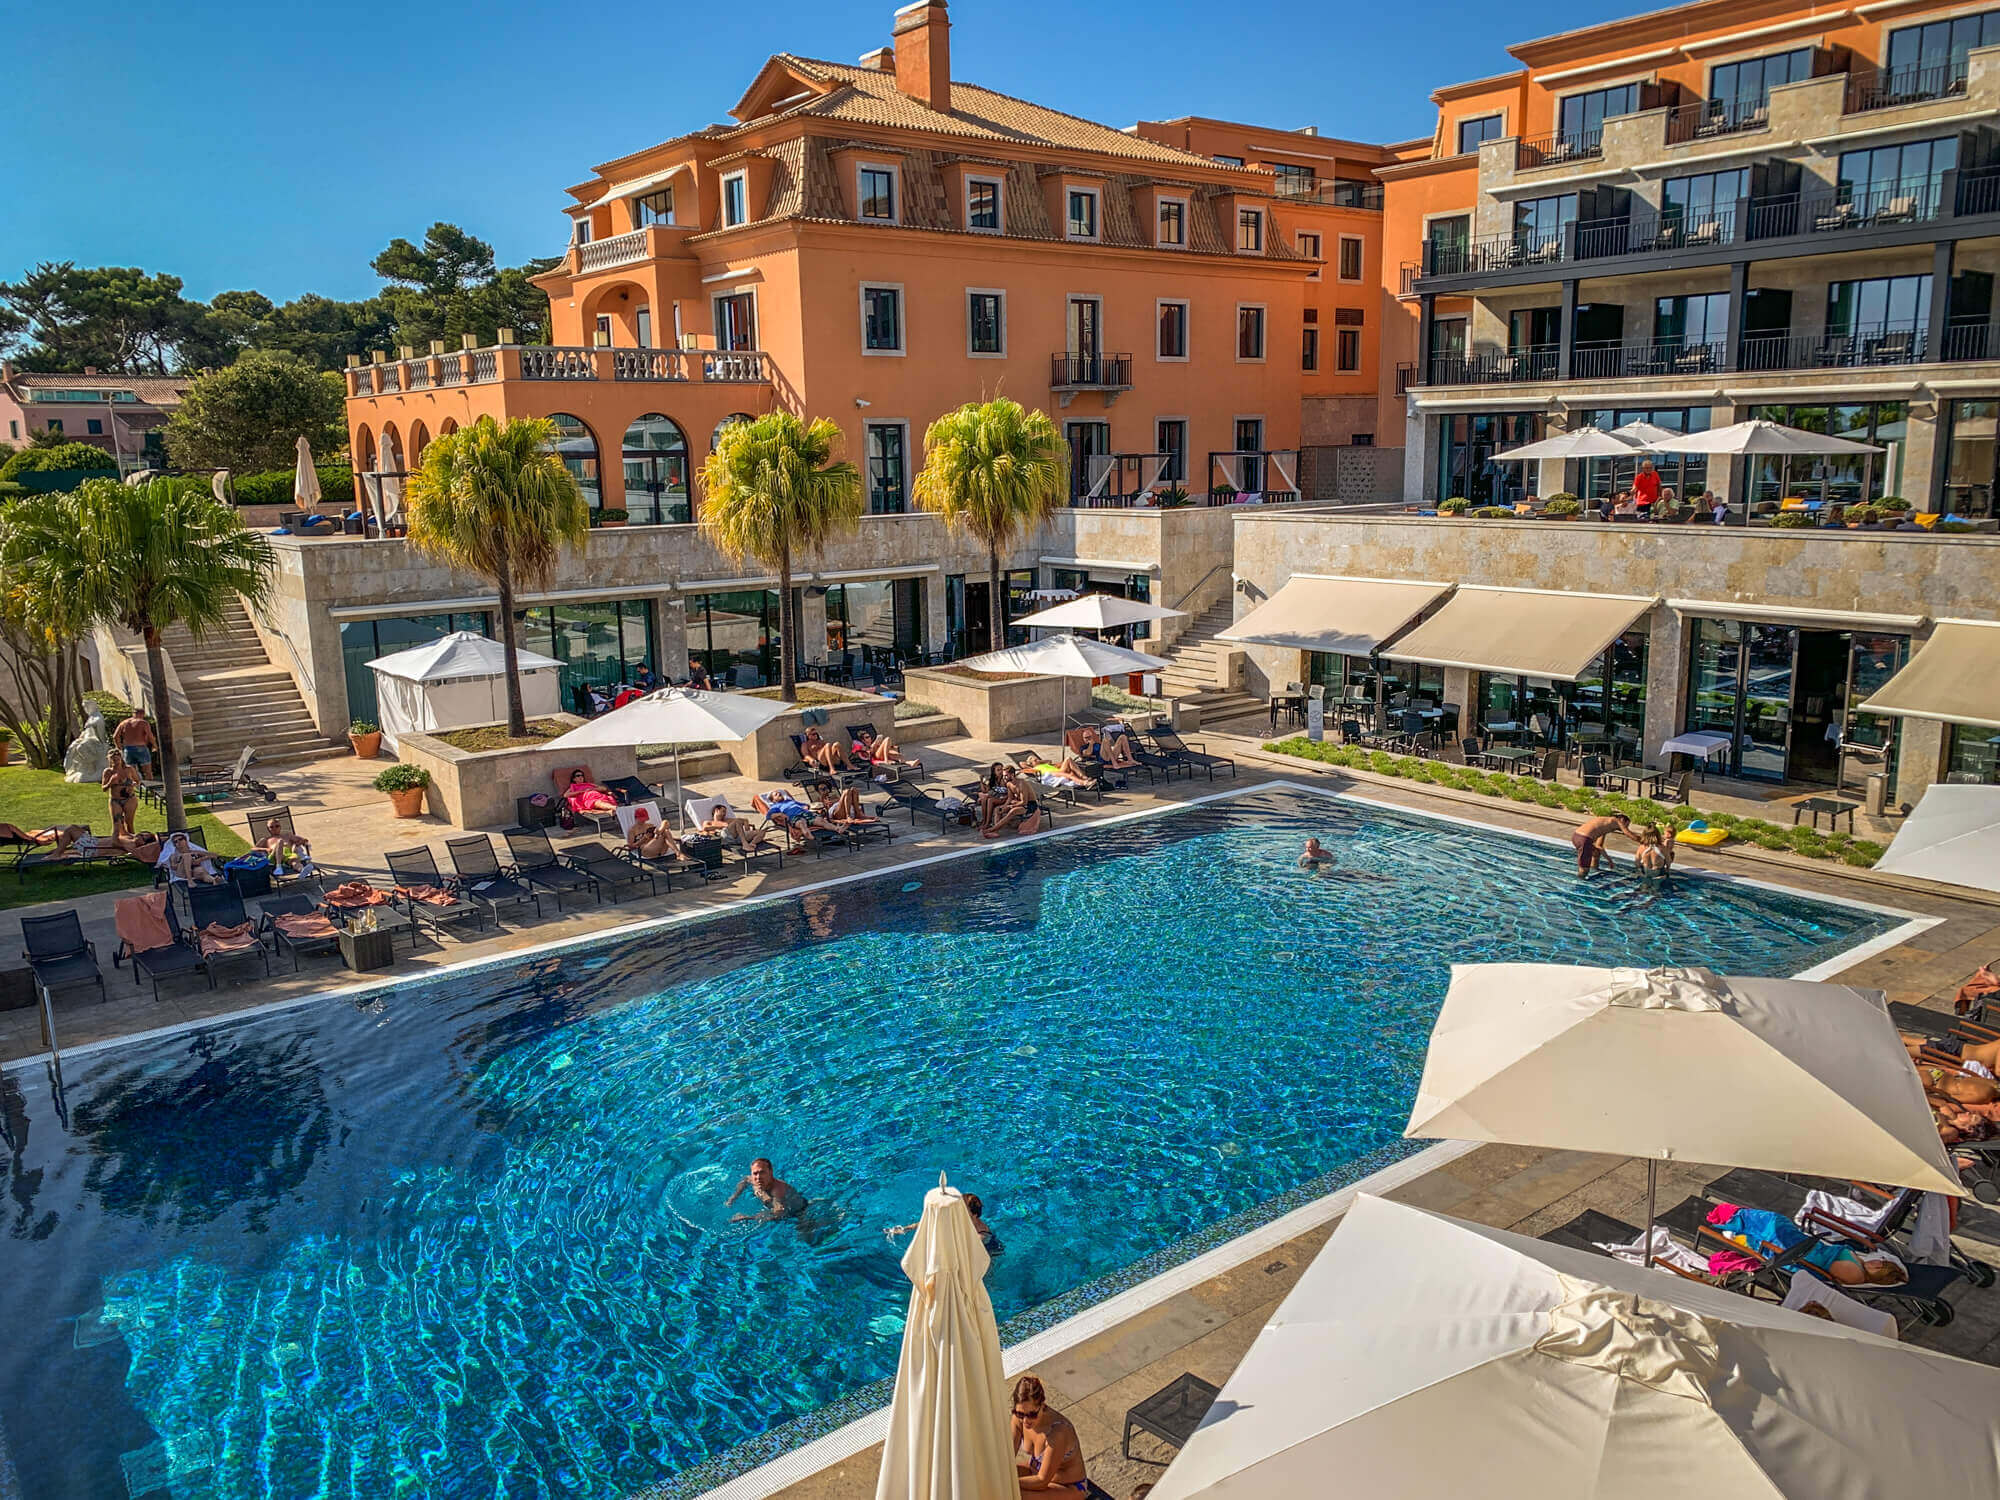 Villa Italia Cascais best hotel